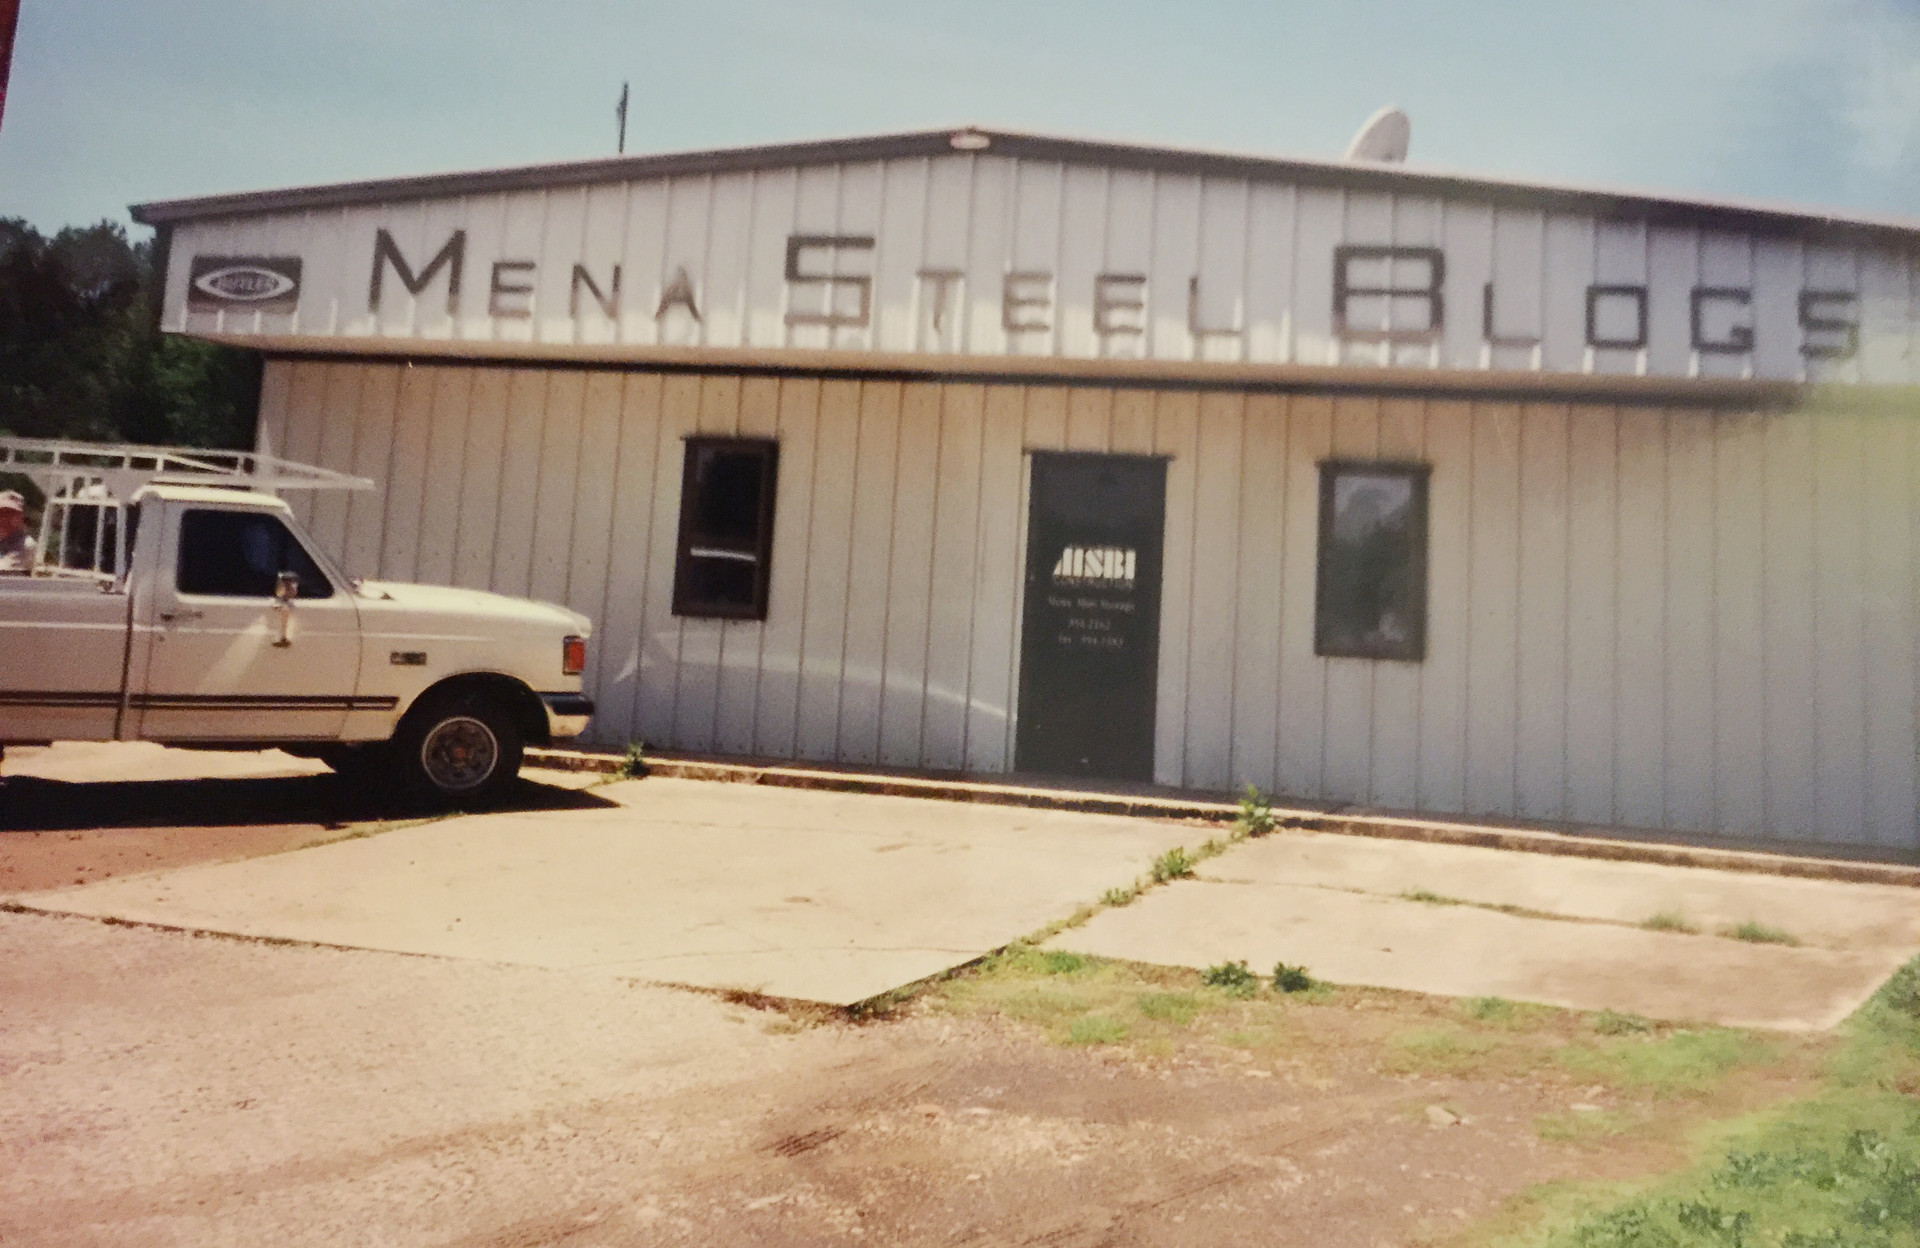 Home office - Mena, Ar 1979